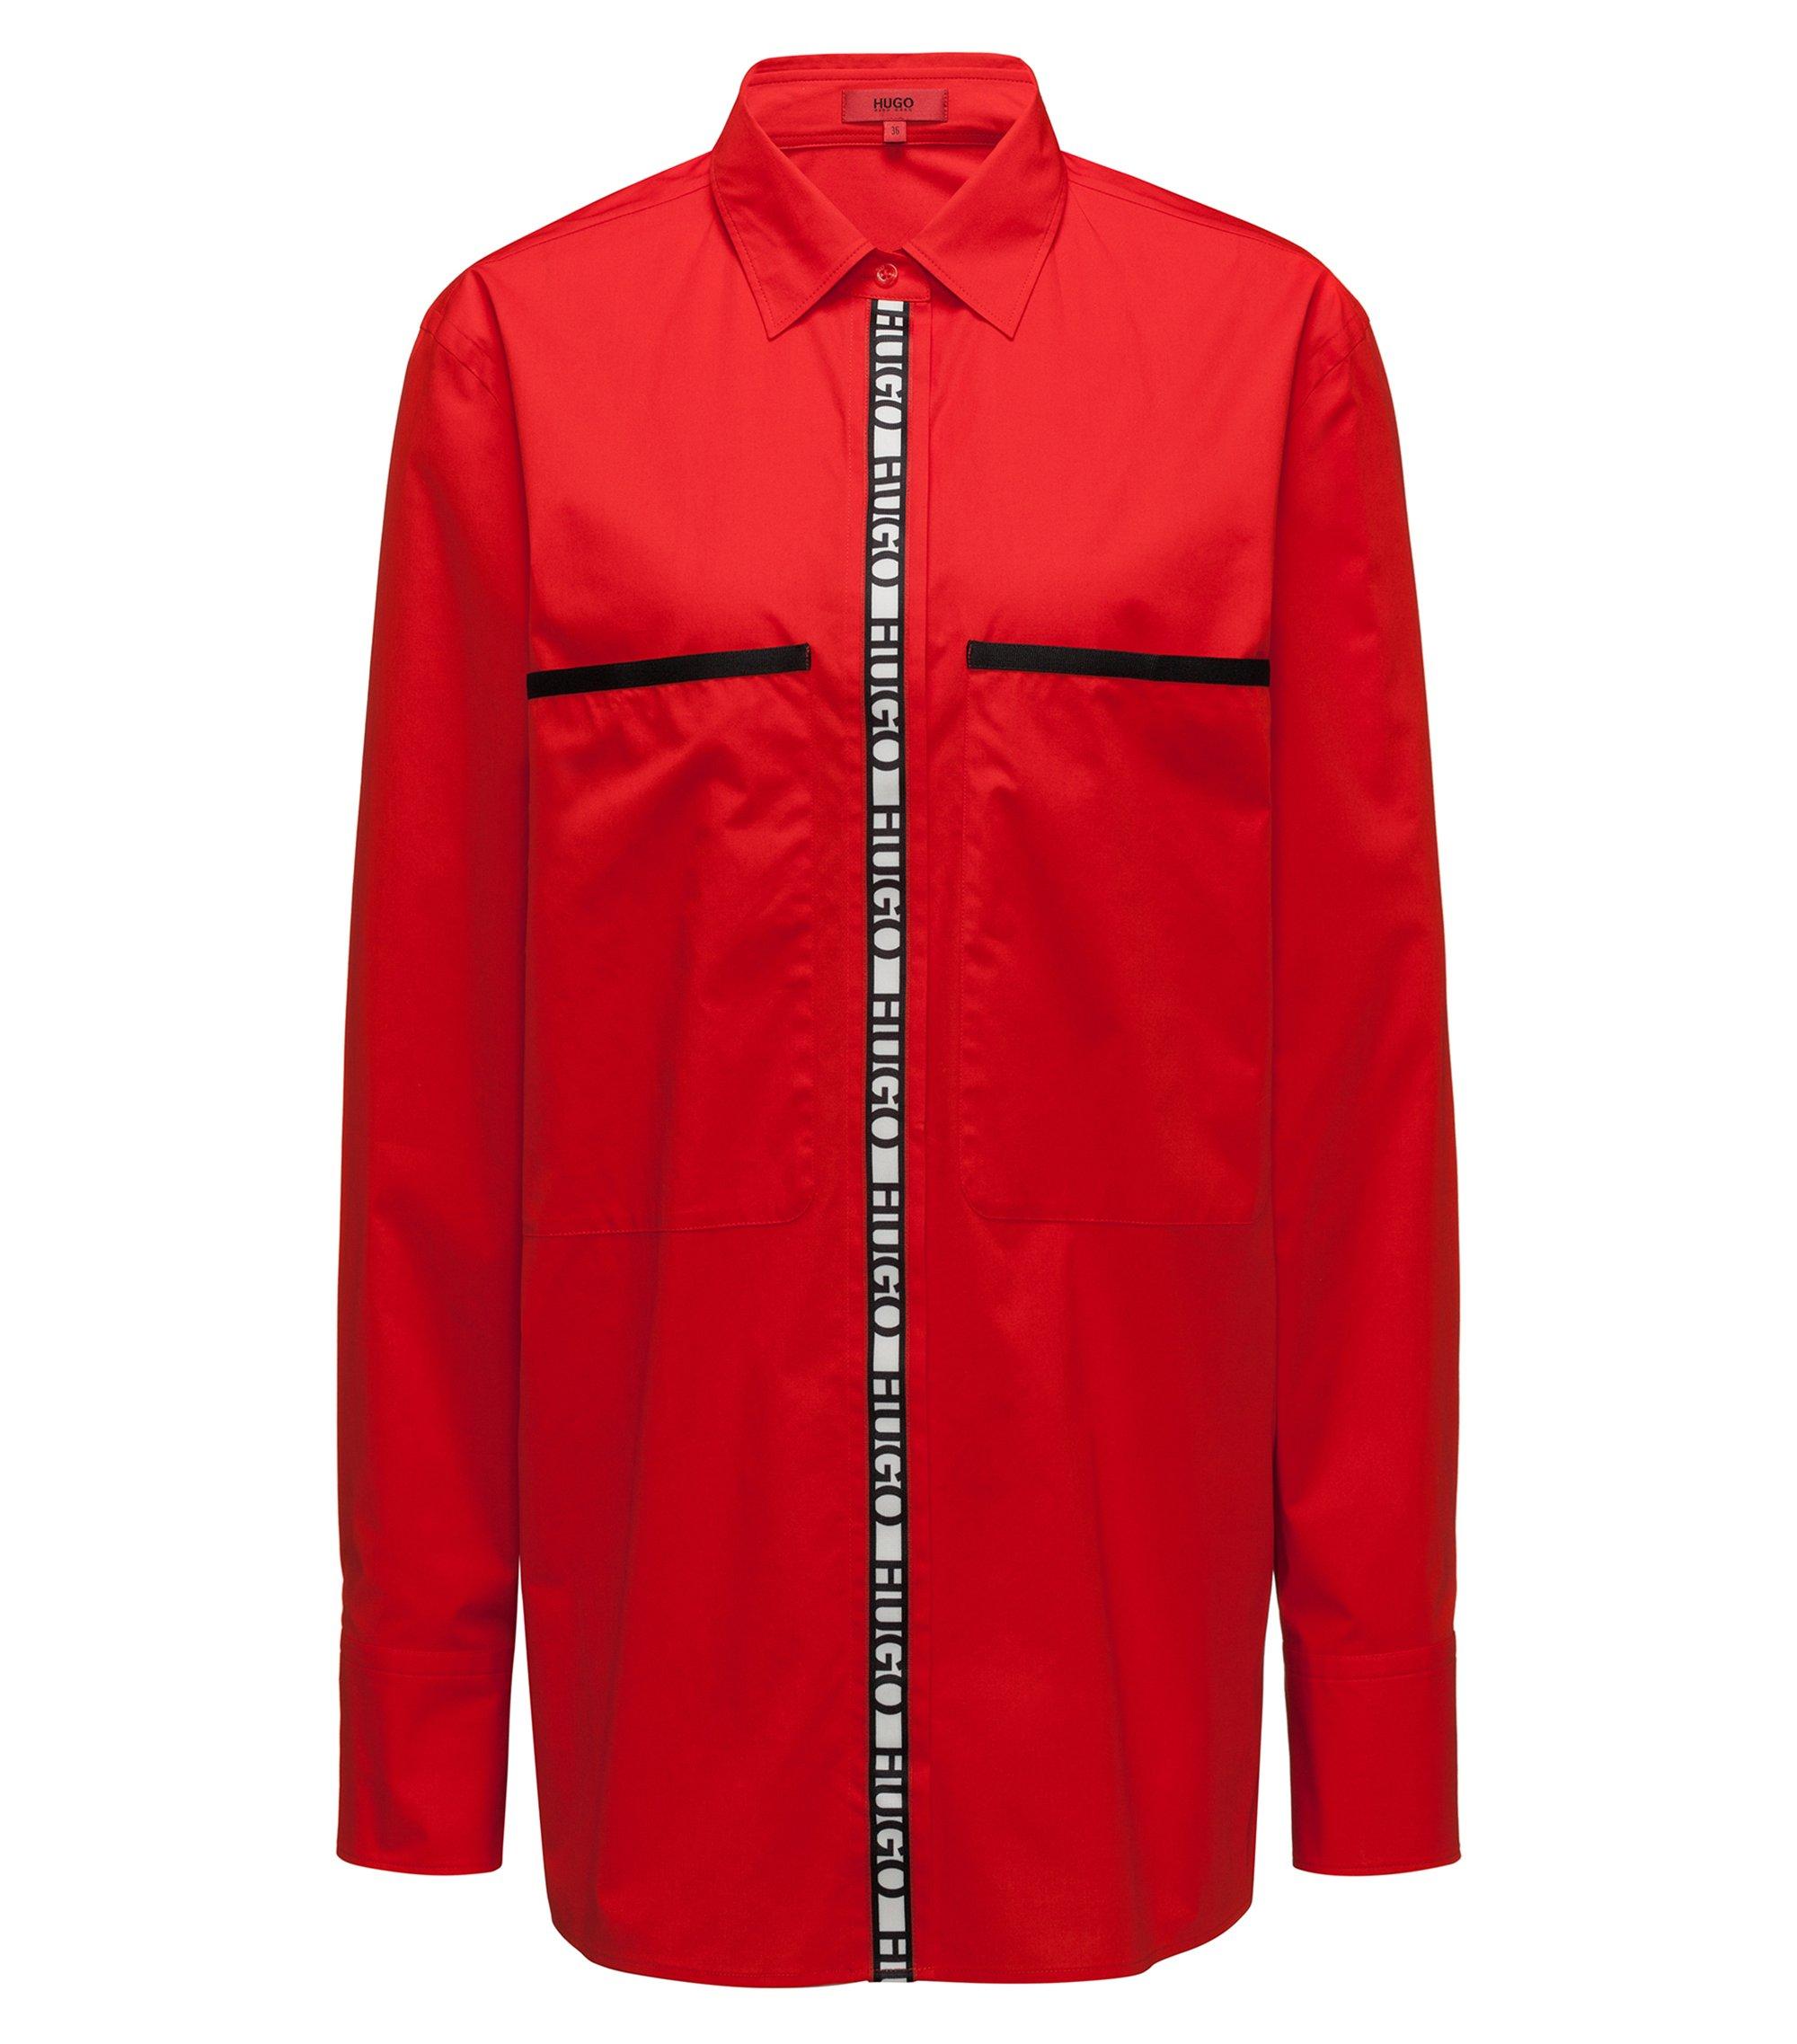 Oversized Bluse aus Stretch-Baumwolle mit Logo-Band, Rot